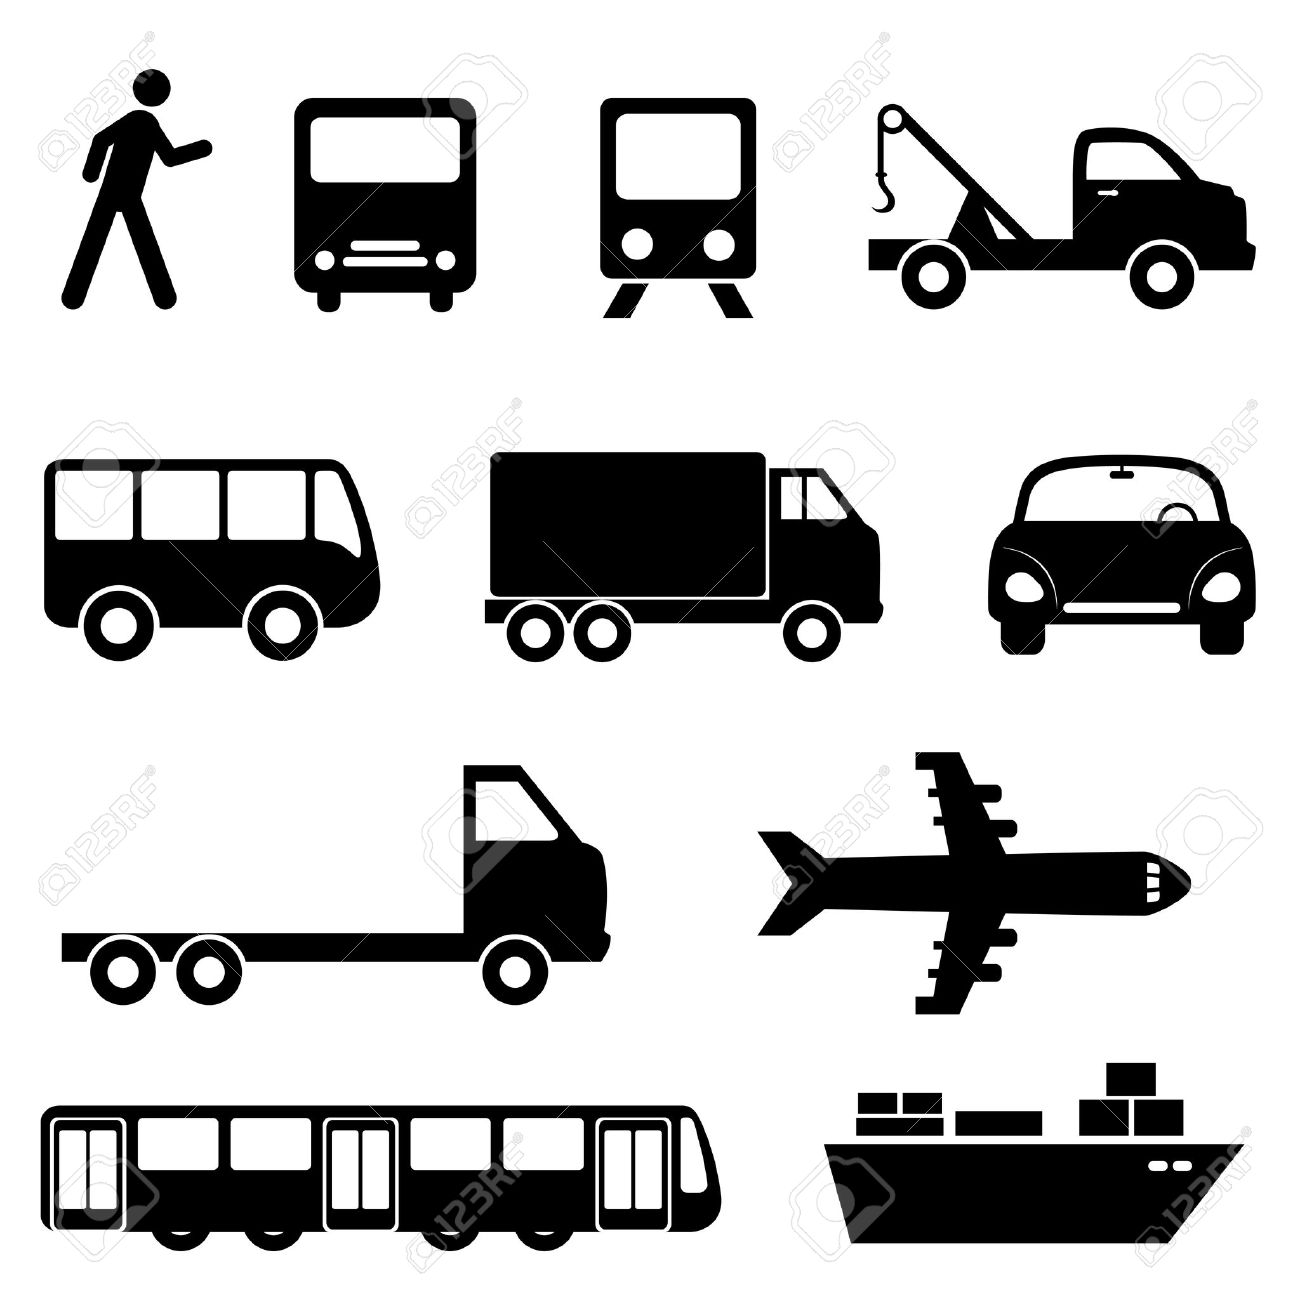 Transportation Icon Set In Black Royalty Free Cliparts, Vectors.